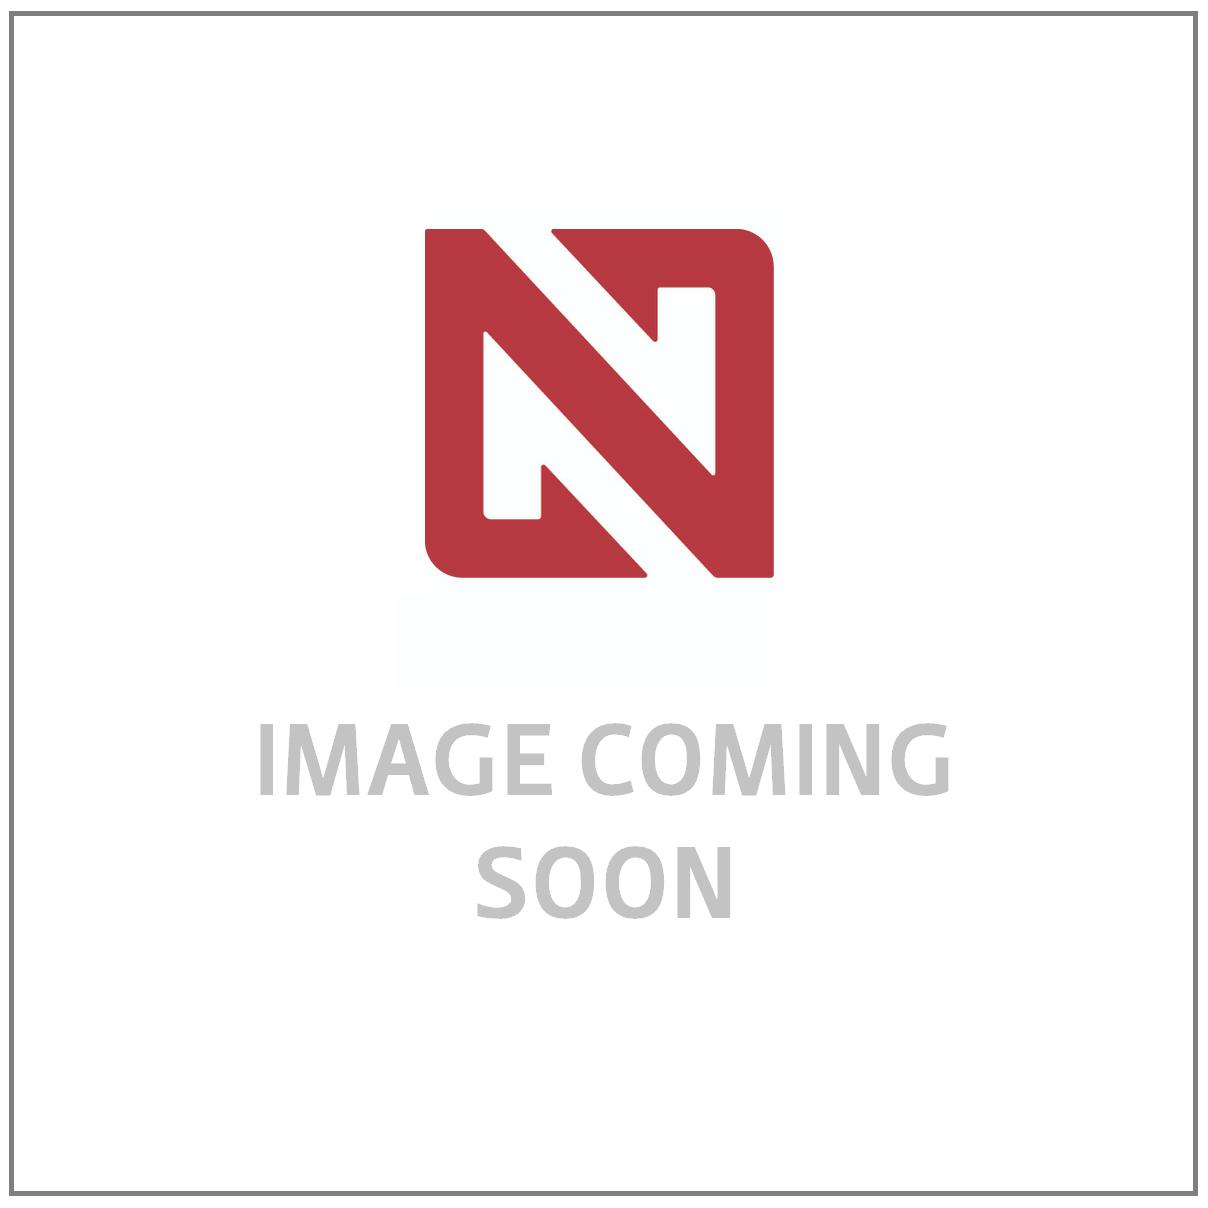 Noble Supply & Logistics Screws - Fasteners